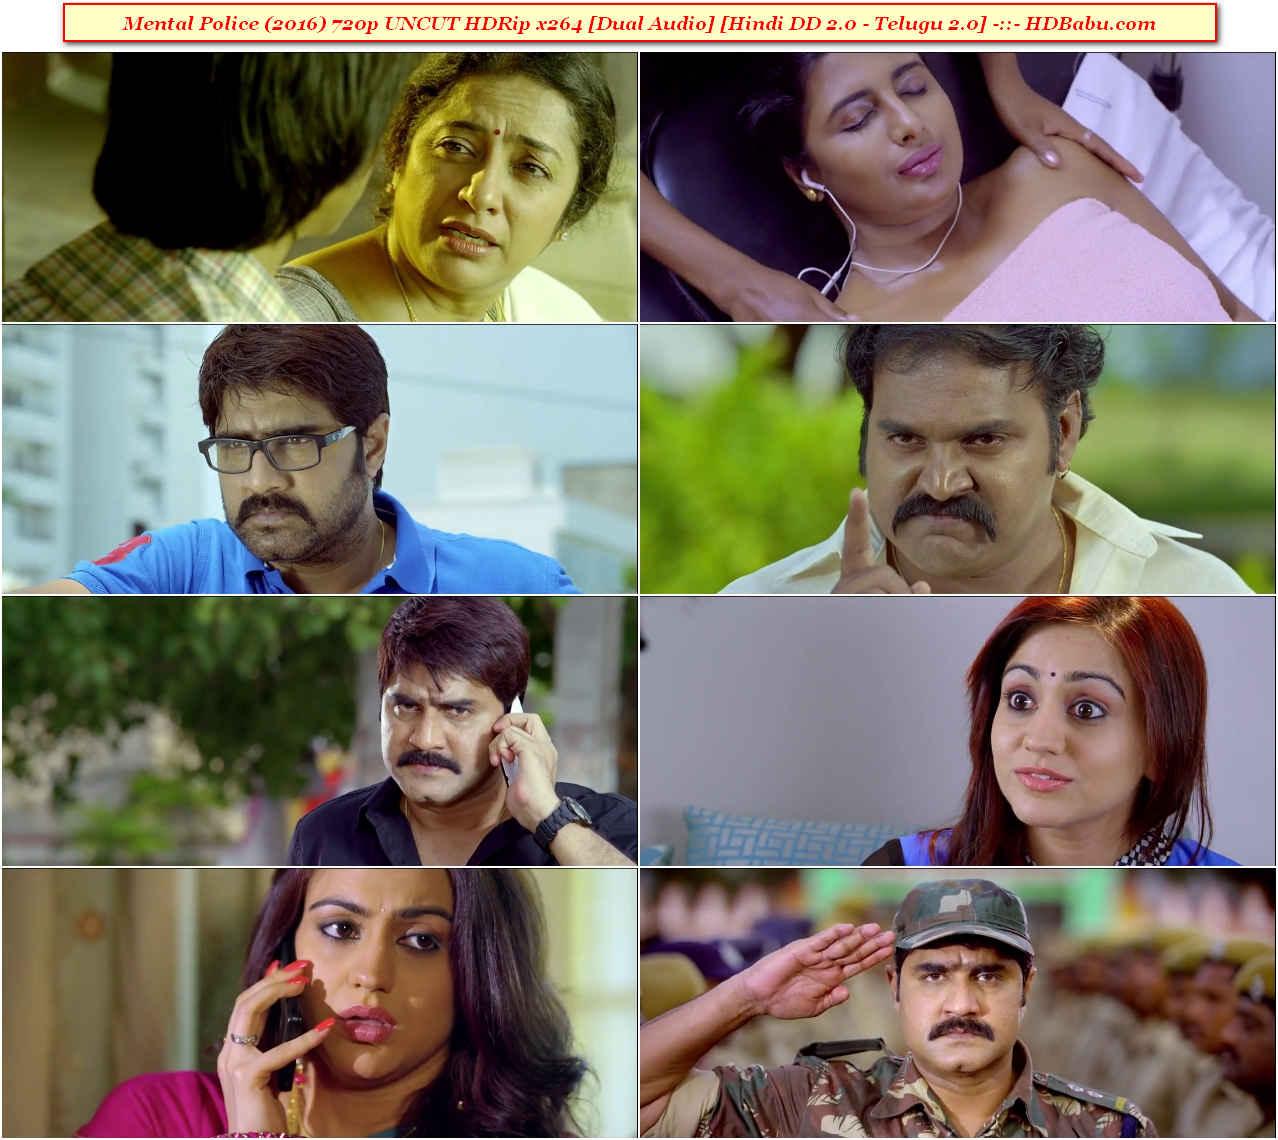 Mental Police Hindi Dual Audio Full Movie Download 720p 2017